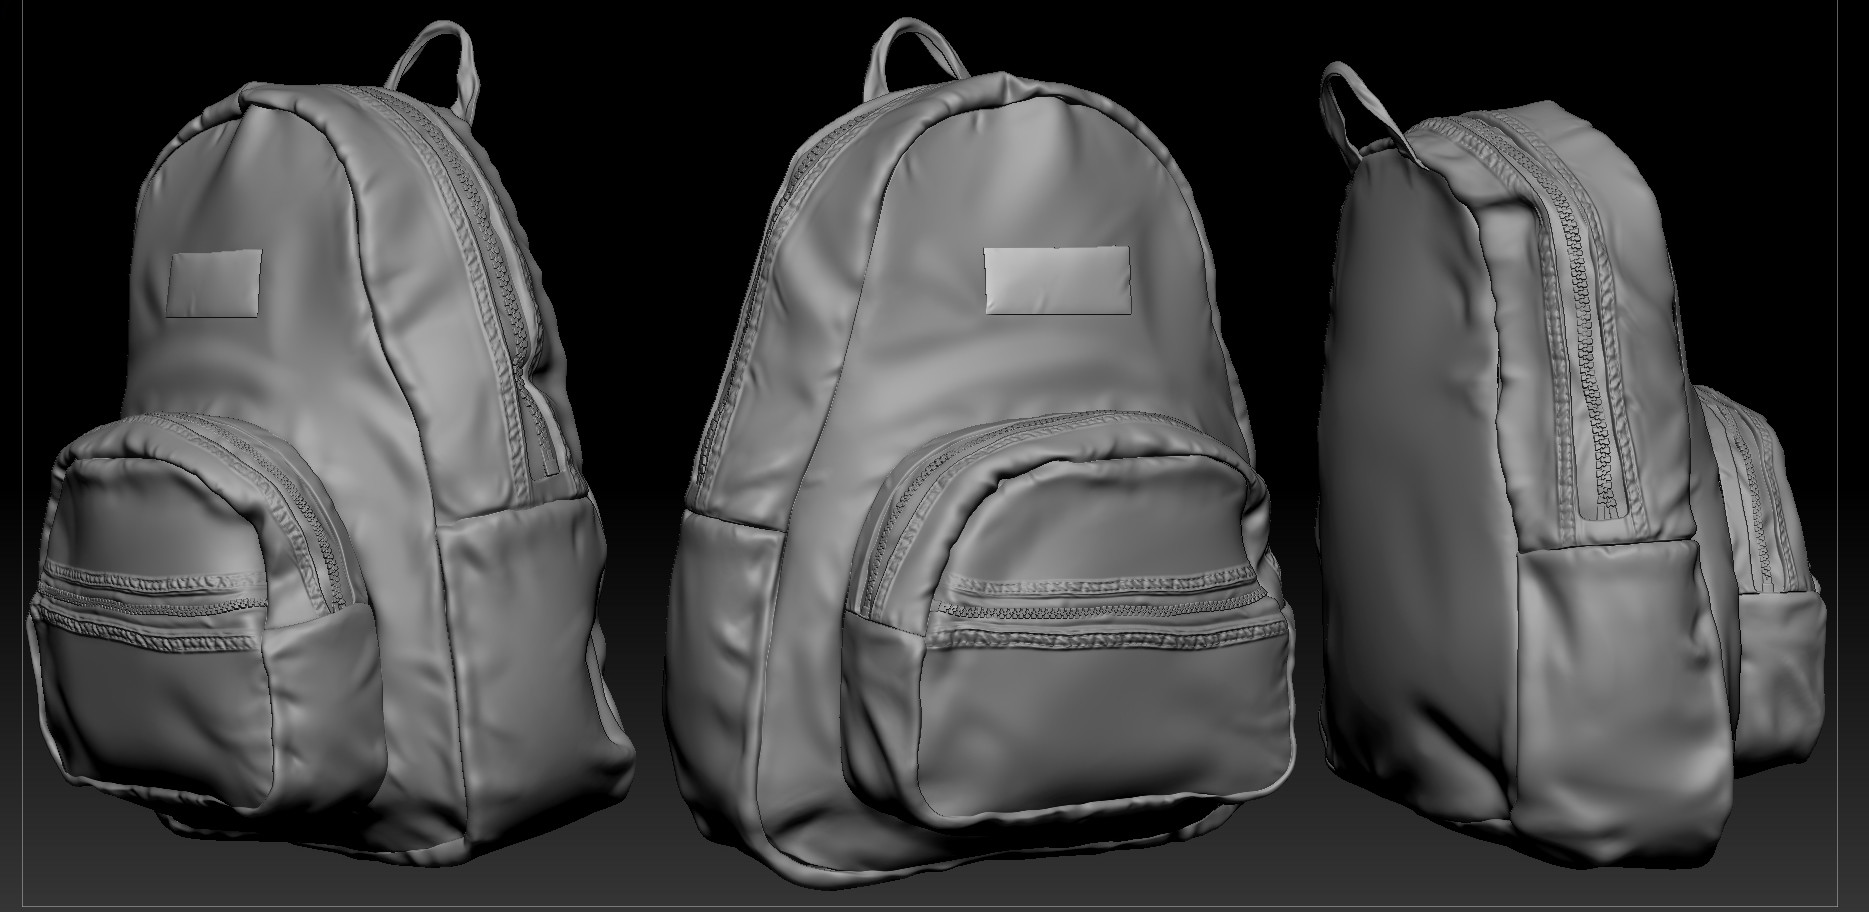 Kurt kupser backpack 03